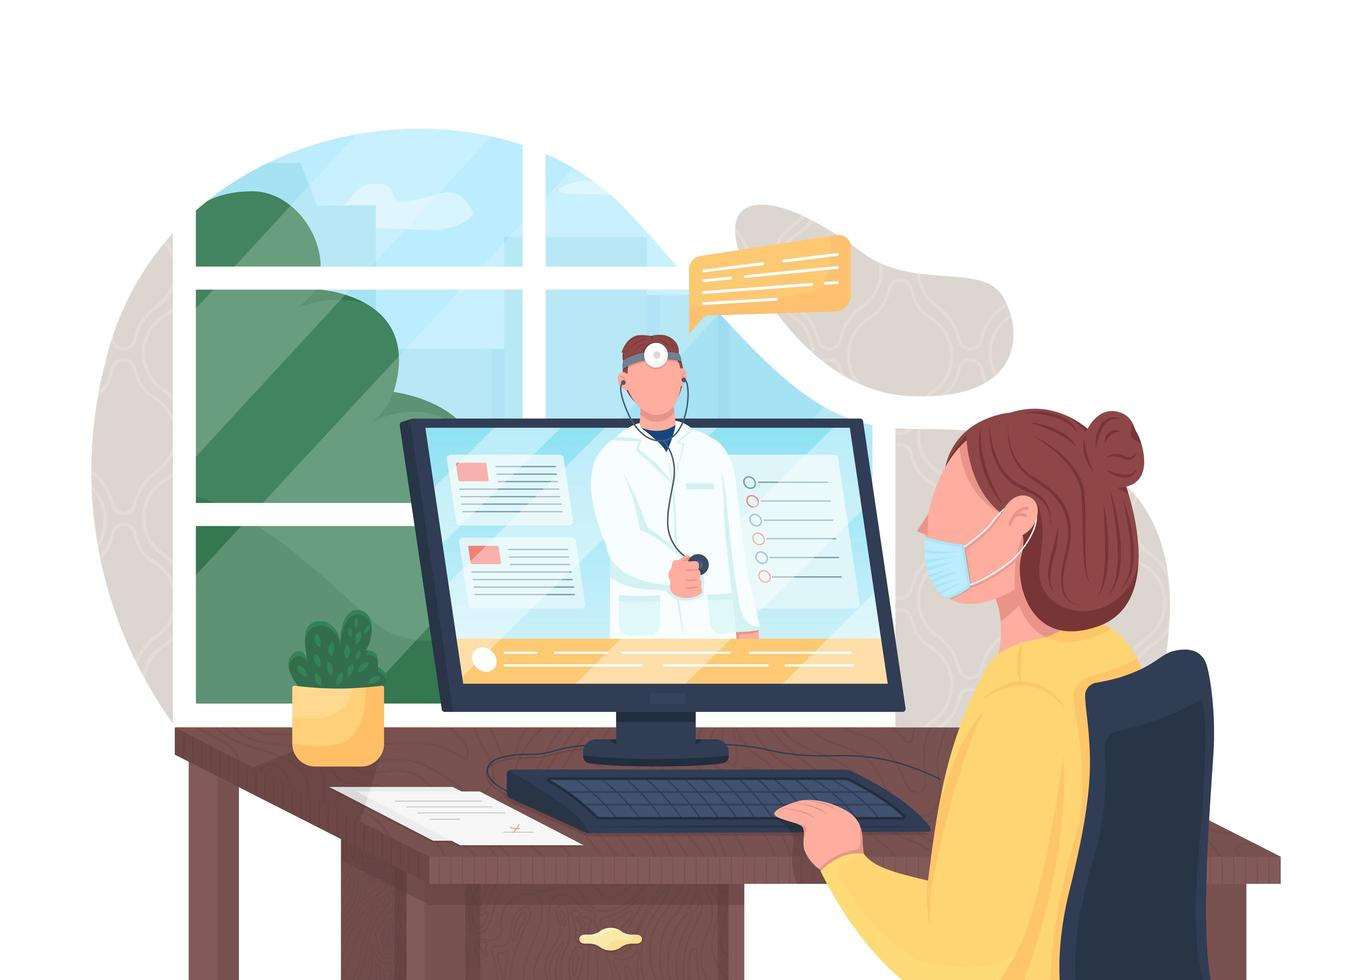 Online doctor consultation vector